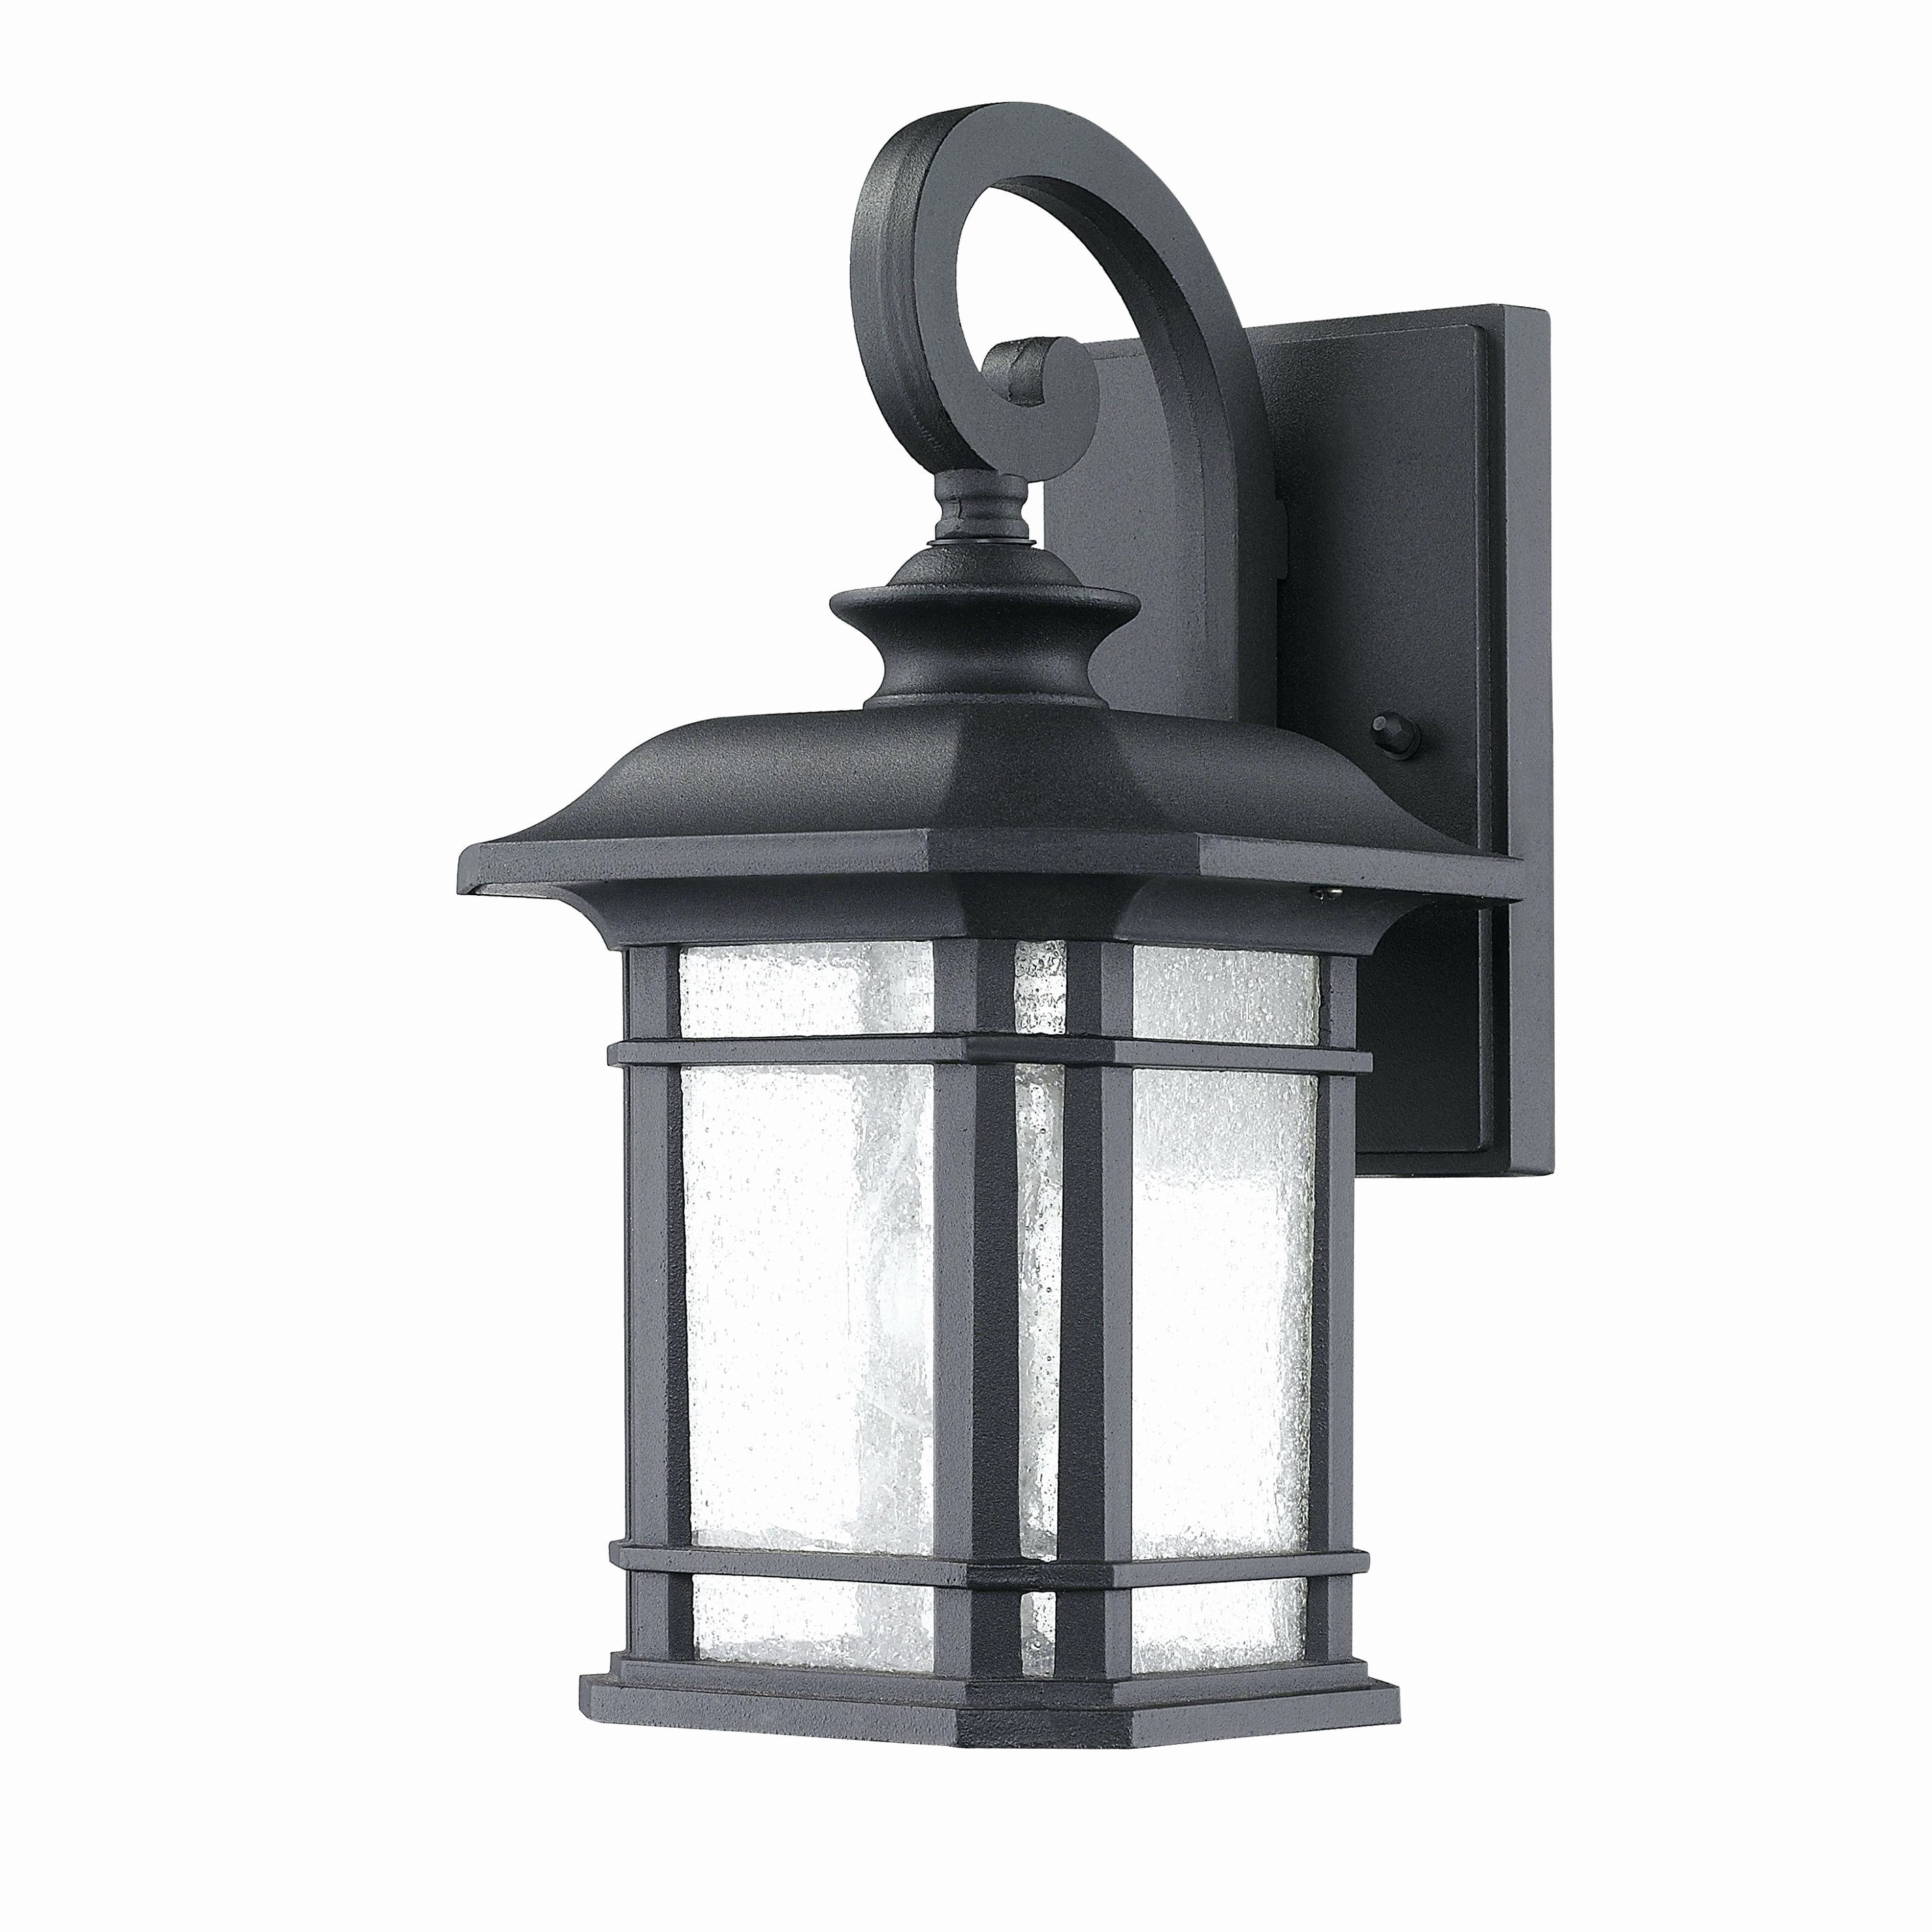 2019 Motion Sensor Post Light Elegant Outdoor Garage Outdoor Lanterns With Regard To Elegant Outdoor Lanterns (View 4 of 20)